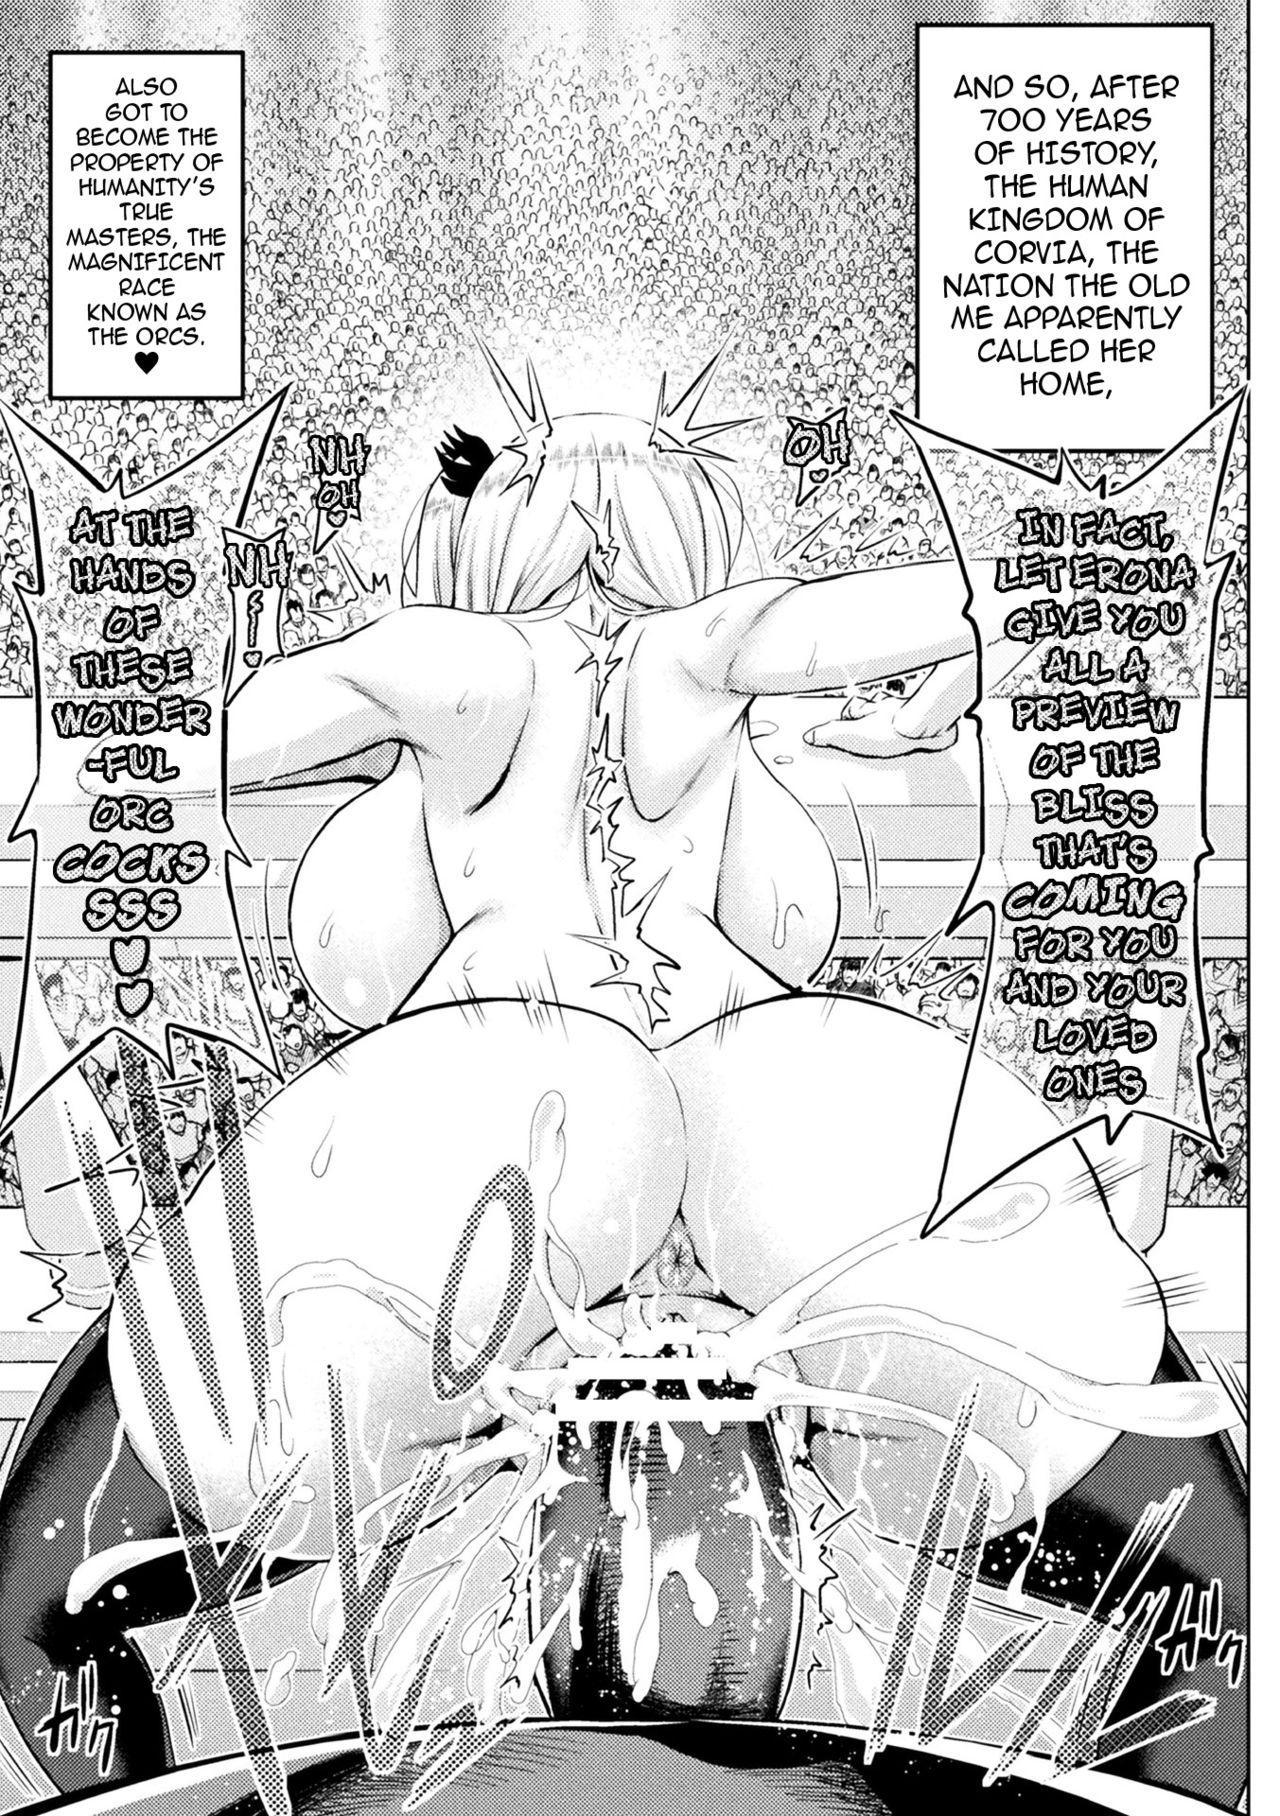 [Yamada Gogogo] Erona ~Orc no Inmon ni Okasareta Onna Kishi no Matsuro~ | Erona ~The Fall of a Beautiful Knight Cursed with the Lewd Mark of an Orc~ Ch. 1-5 [English] {darknight} 103